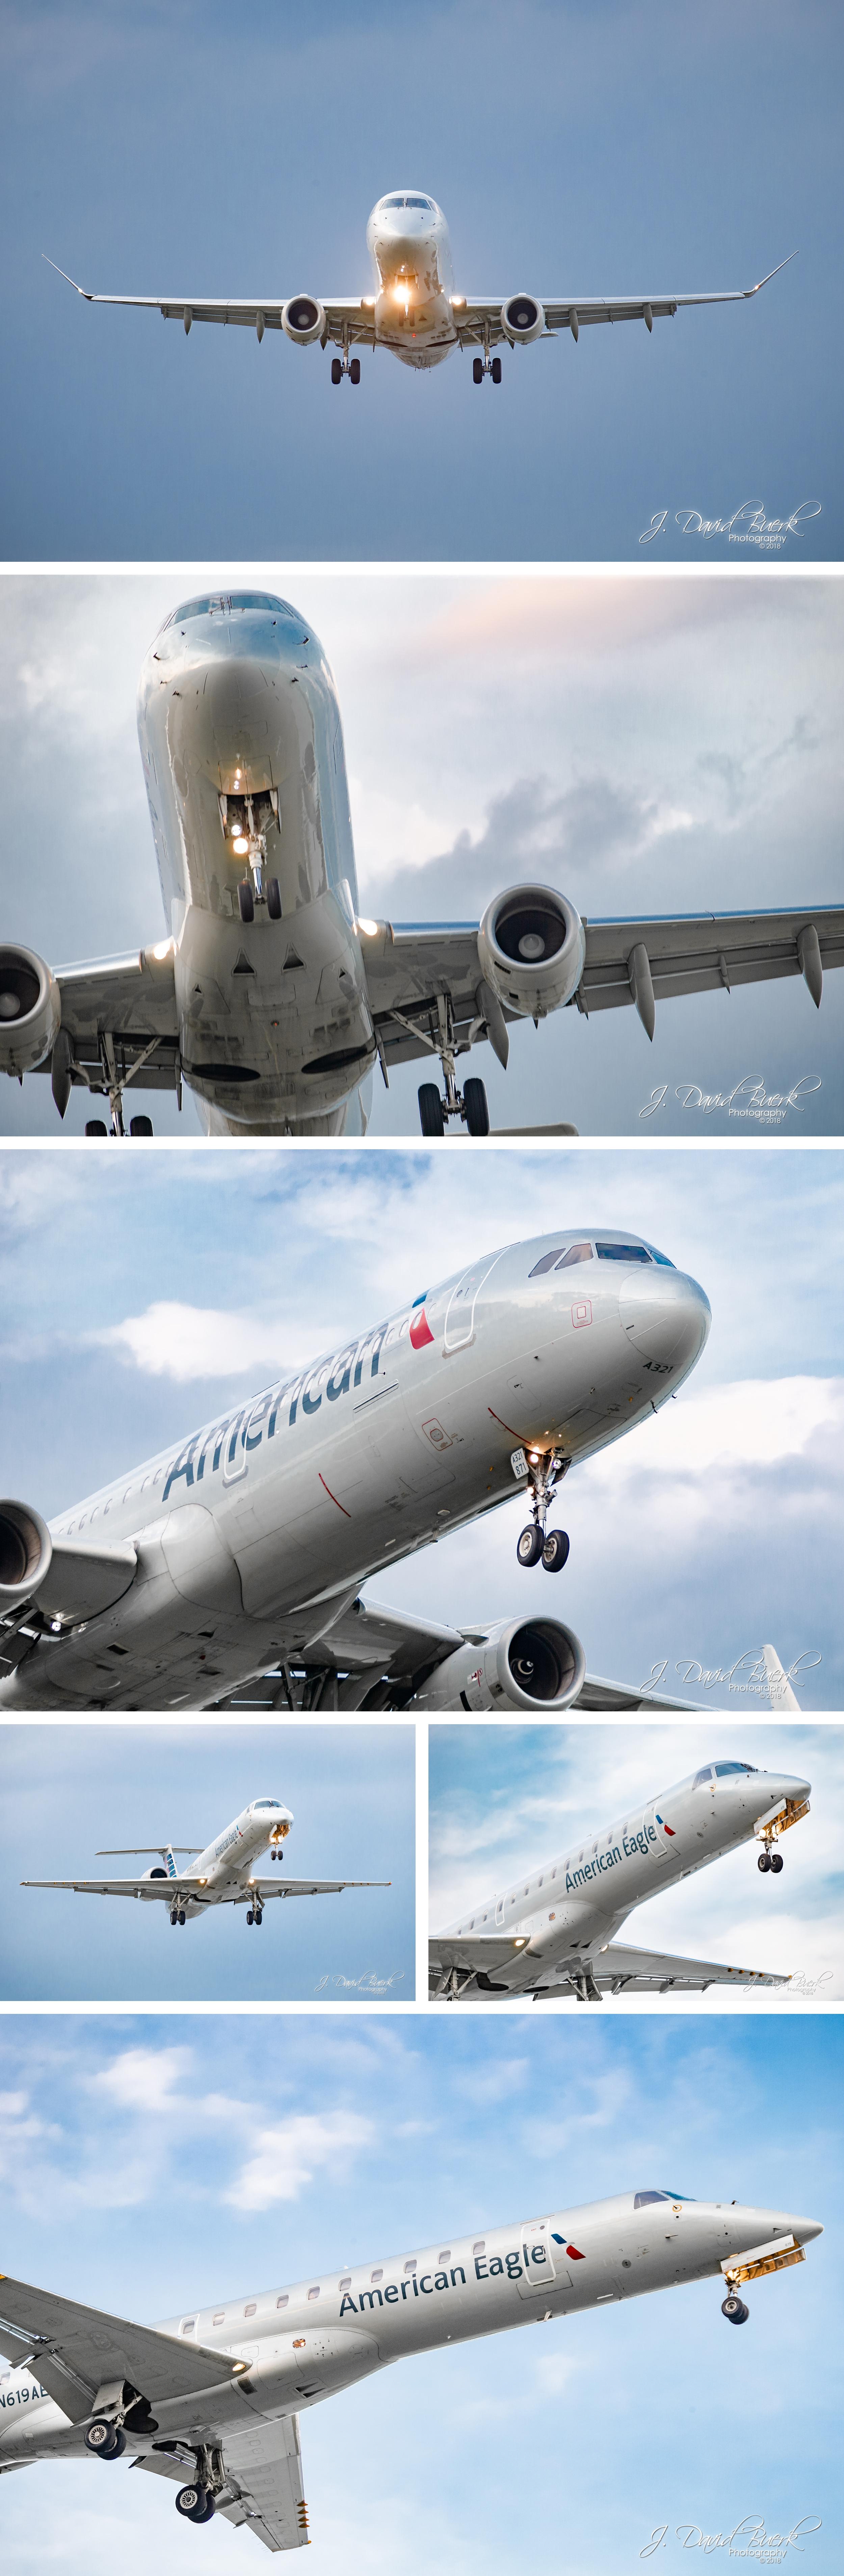 DCA Planespotting 4.jpg